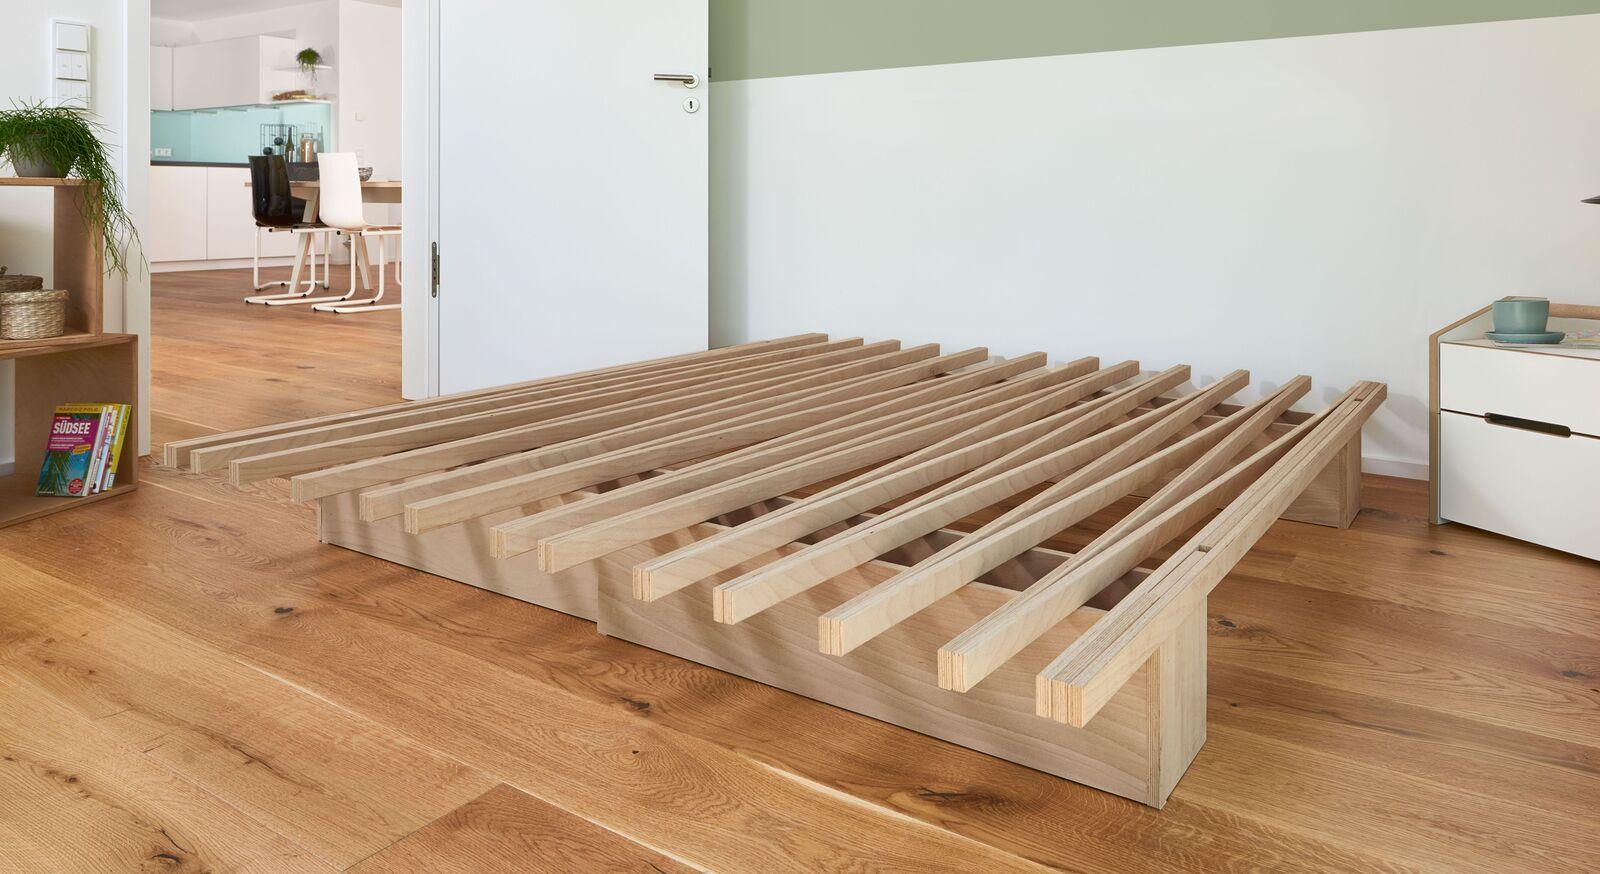 Bettsystem Tojo V mit stabiler Konstruktion